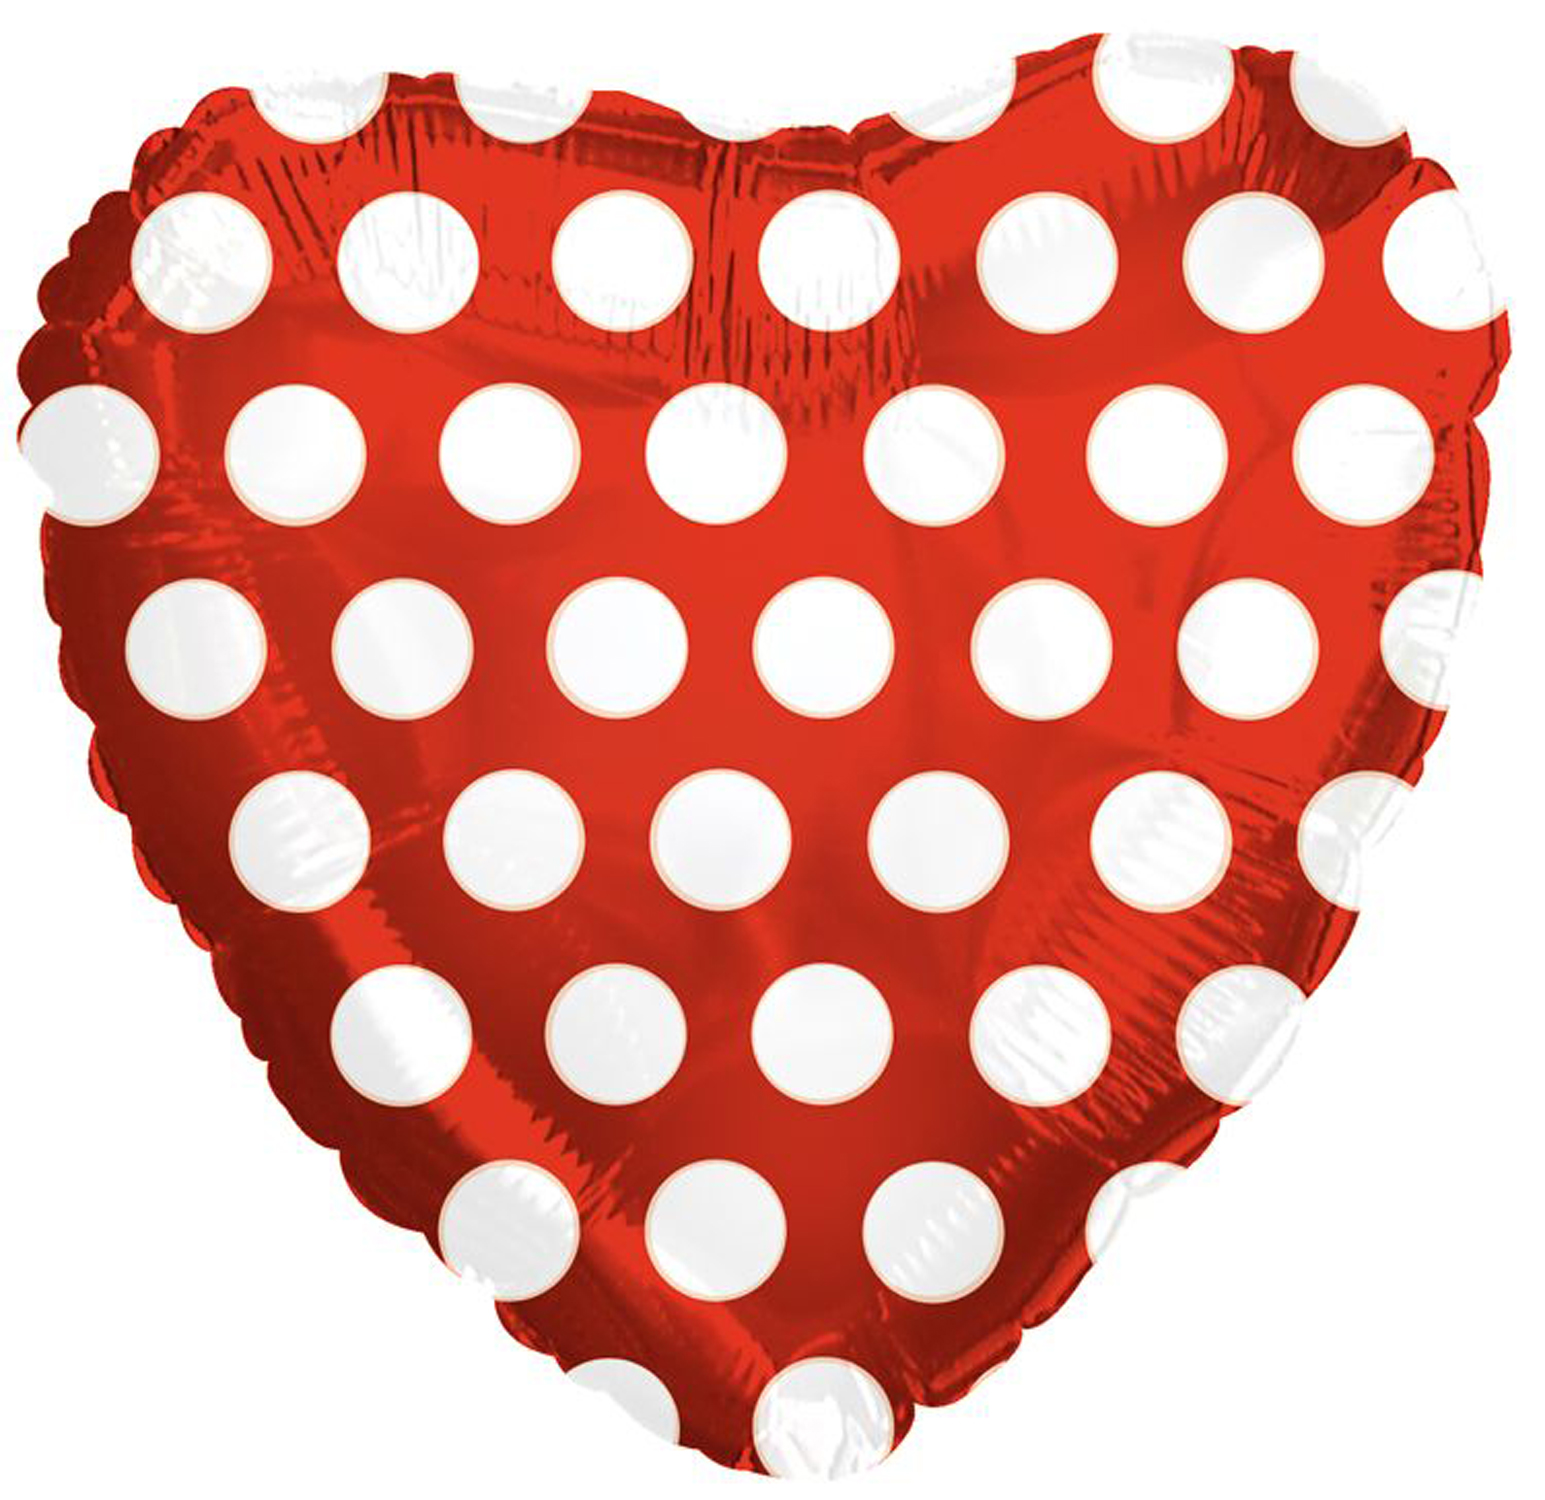 CTI Polka Dot Heart Shaped Valentine 18' Foil Balloon, Red White